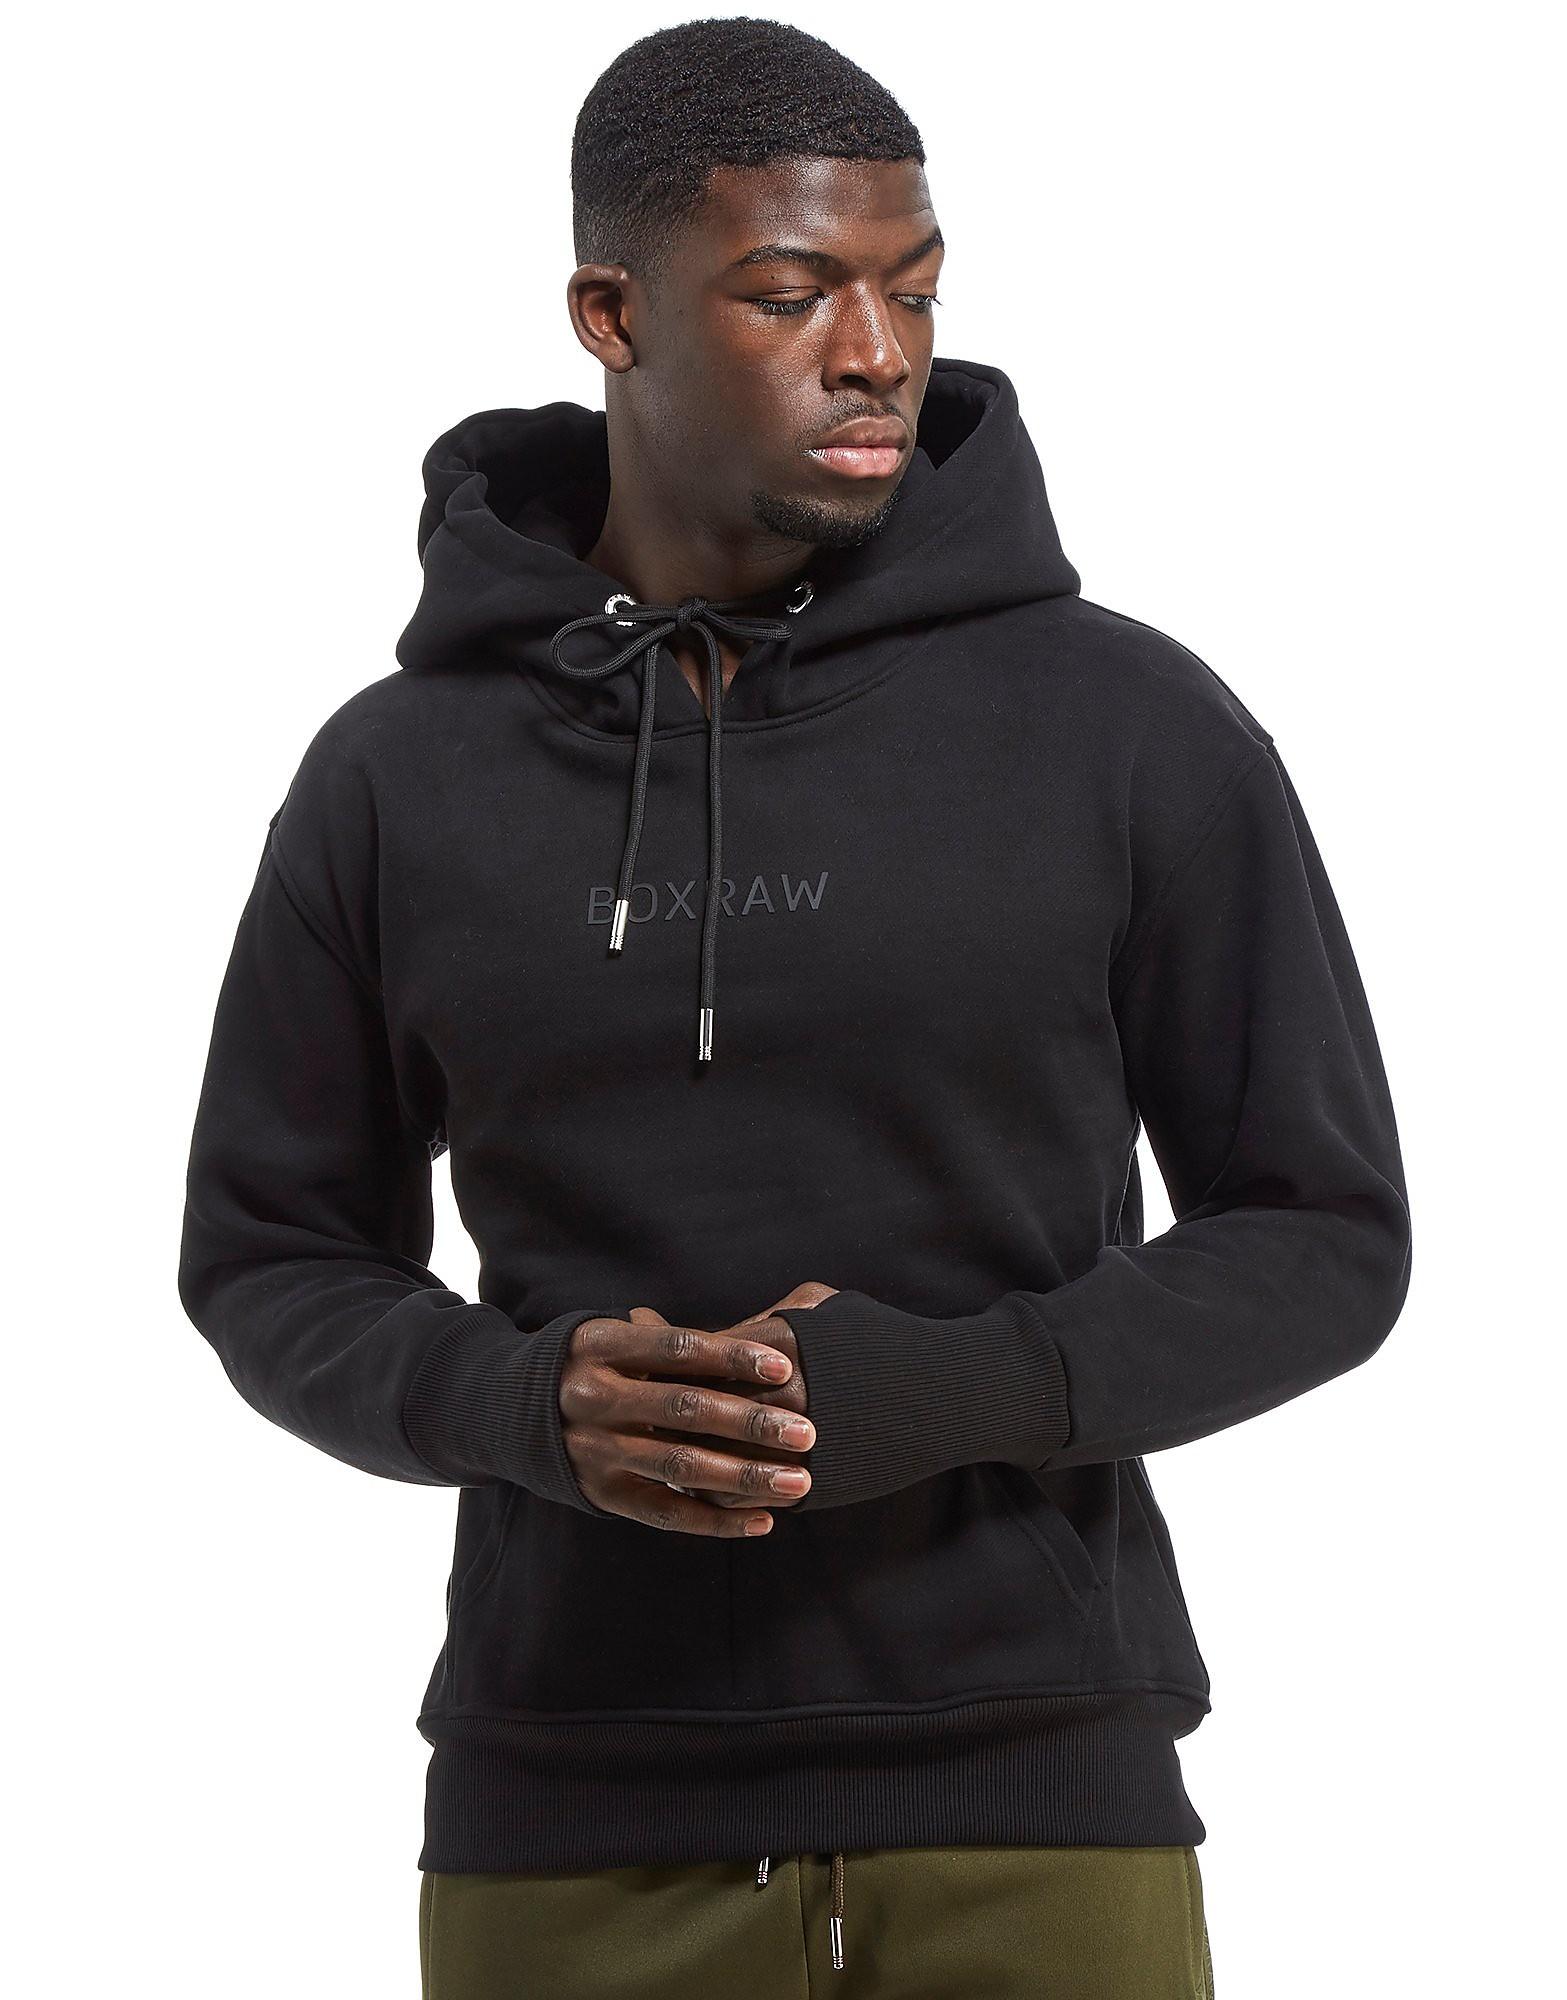 BOXRAW Dempsey Hoodie Black - Black, Black